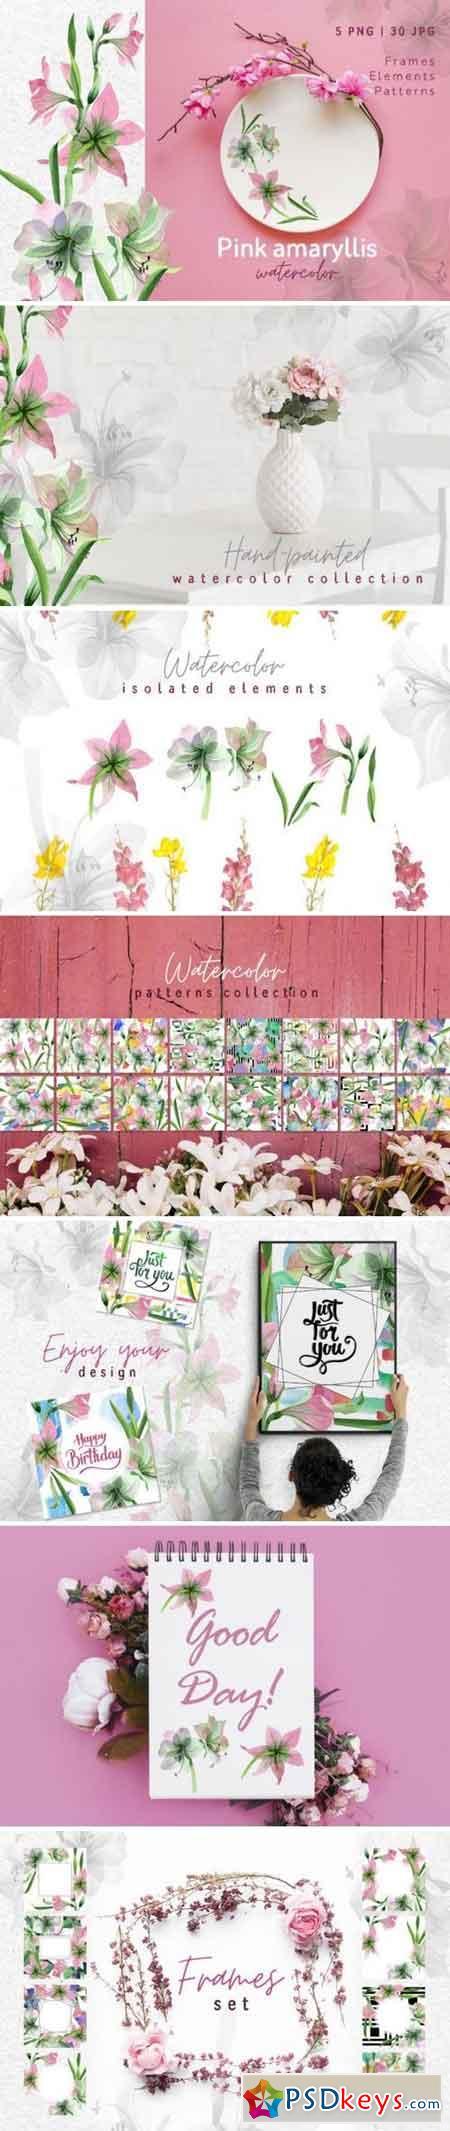 Pink amaryllis Watercolor png 3360682